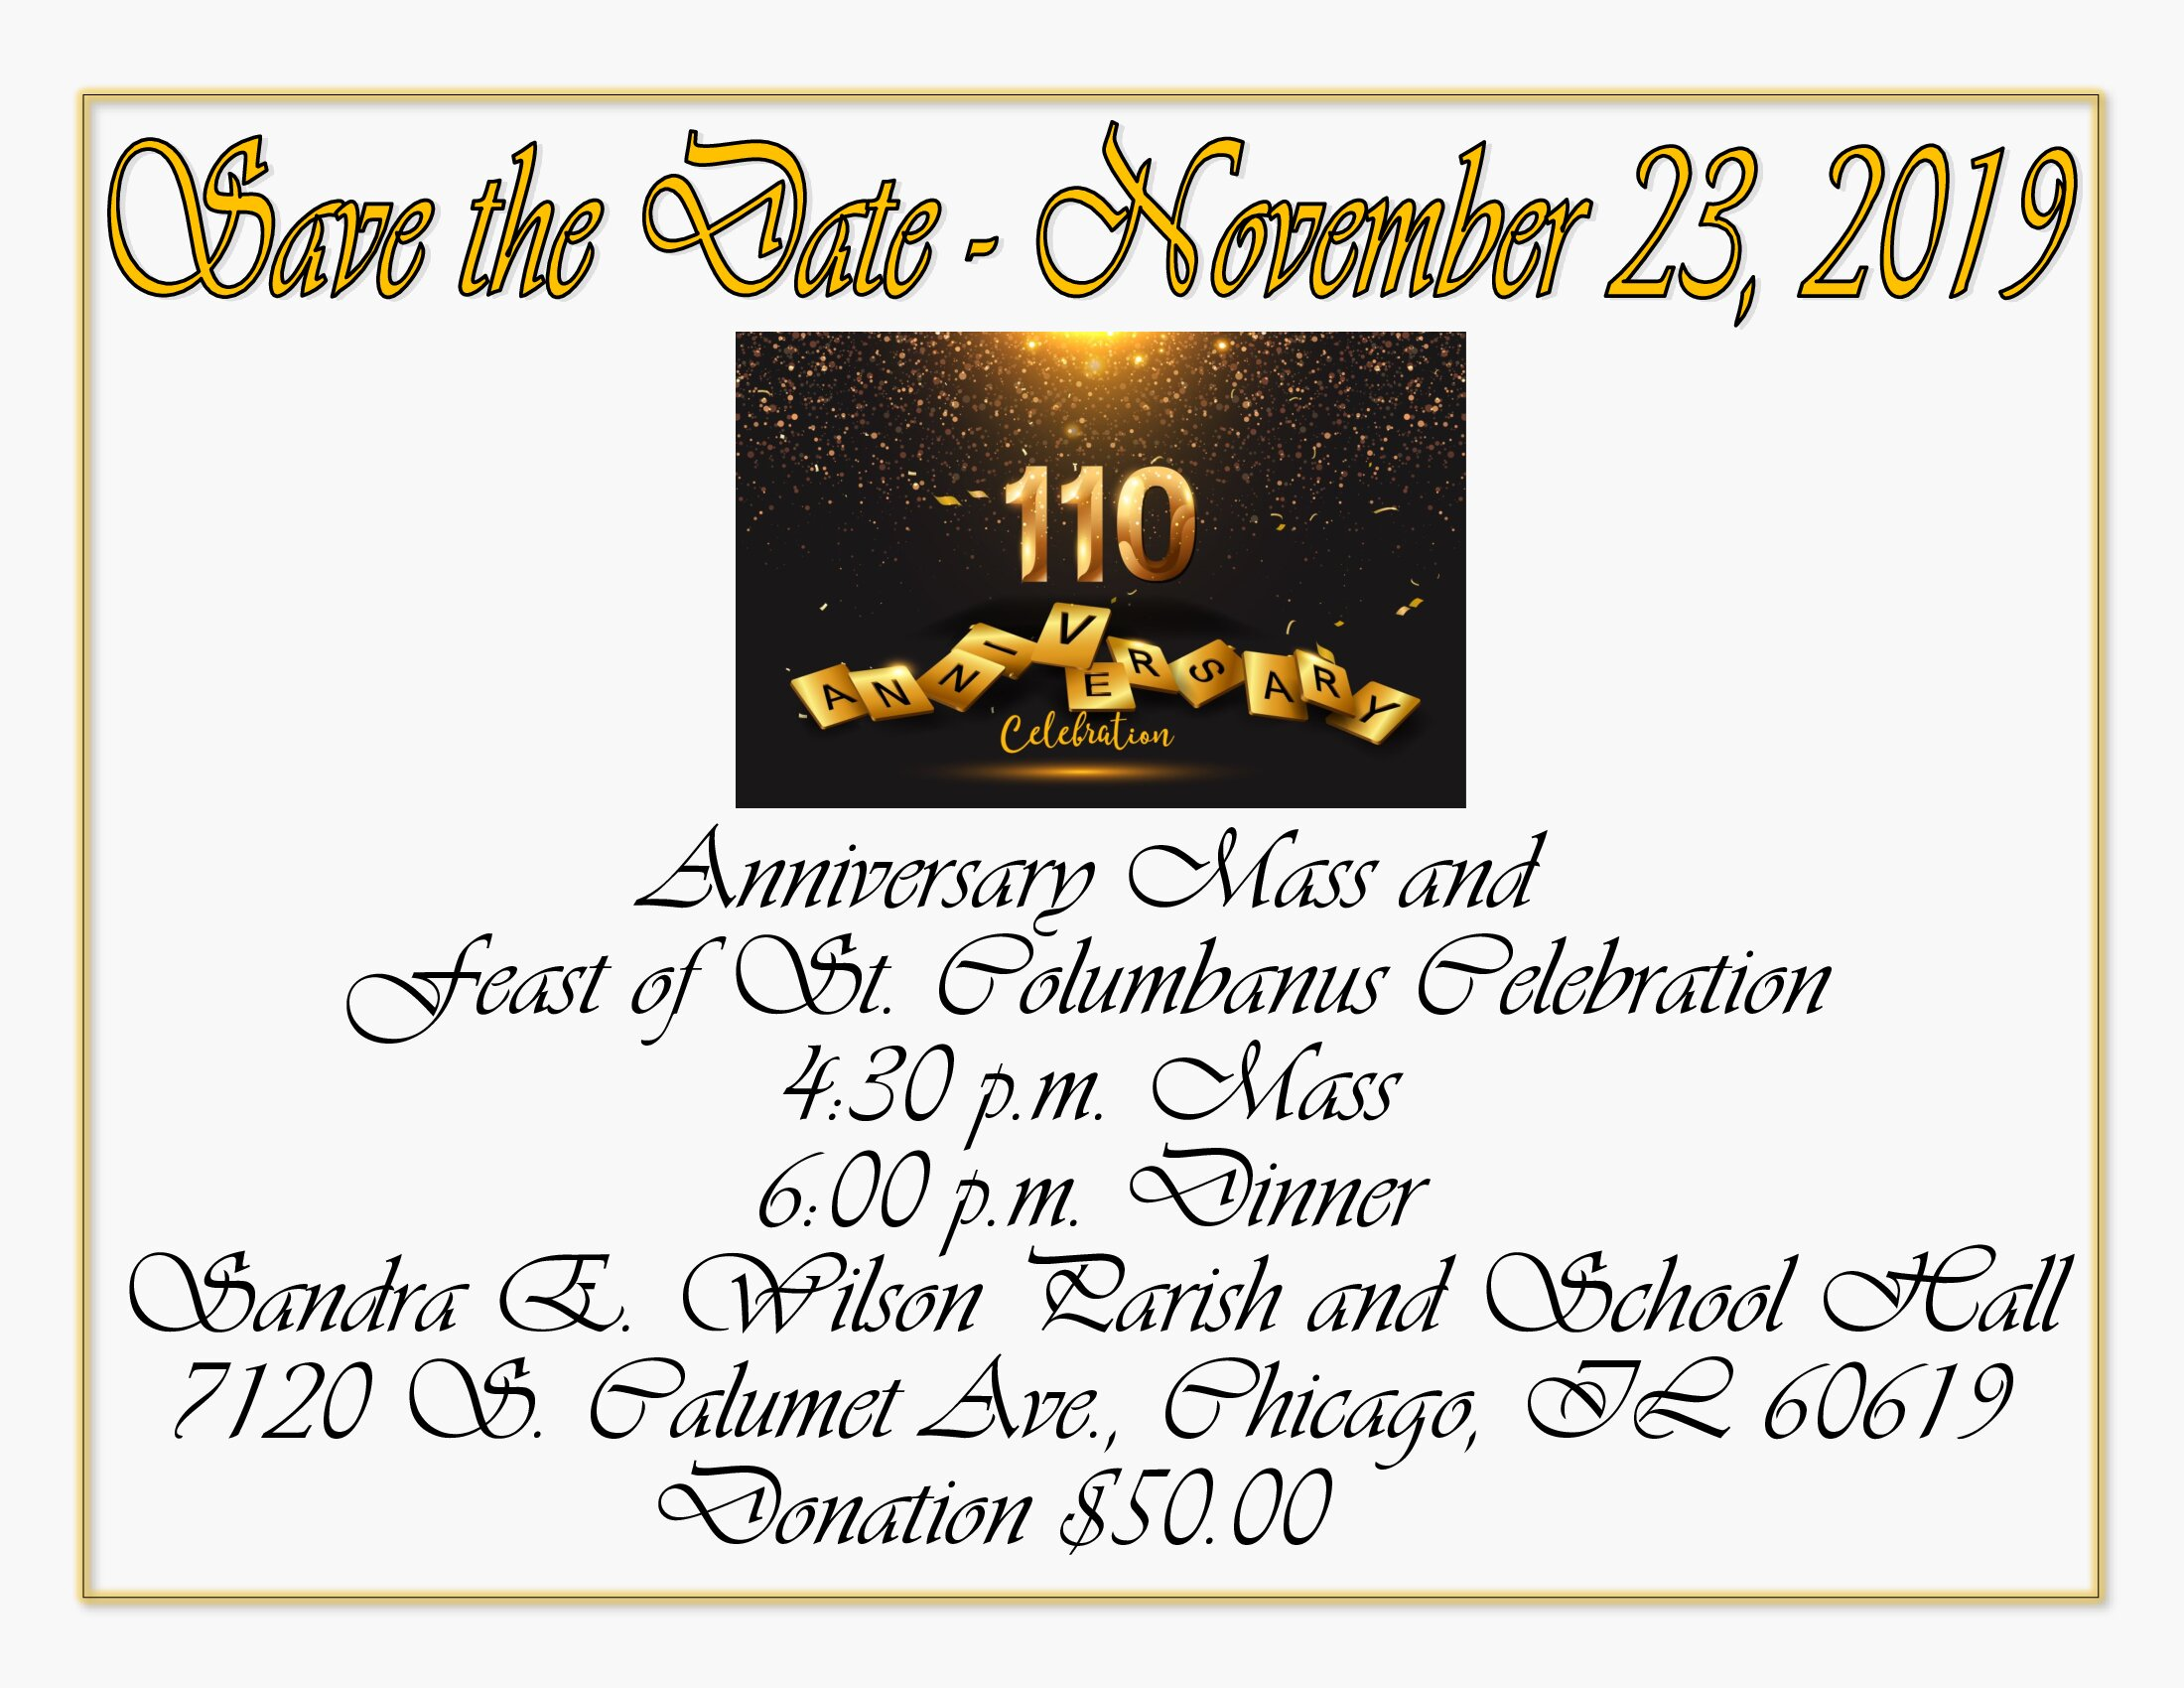 Feast of St. Columbanus Celebration Save the Date Flyer.08.22.2019.jpg